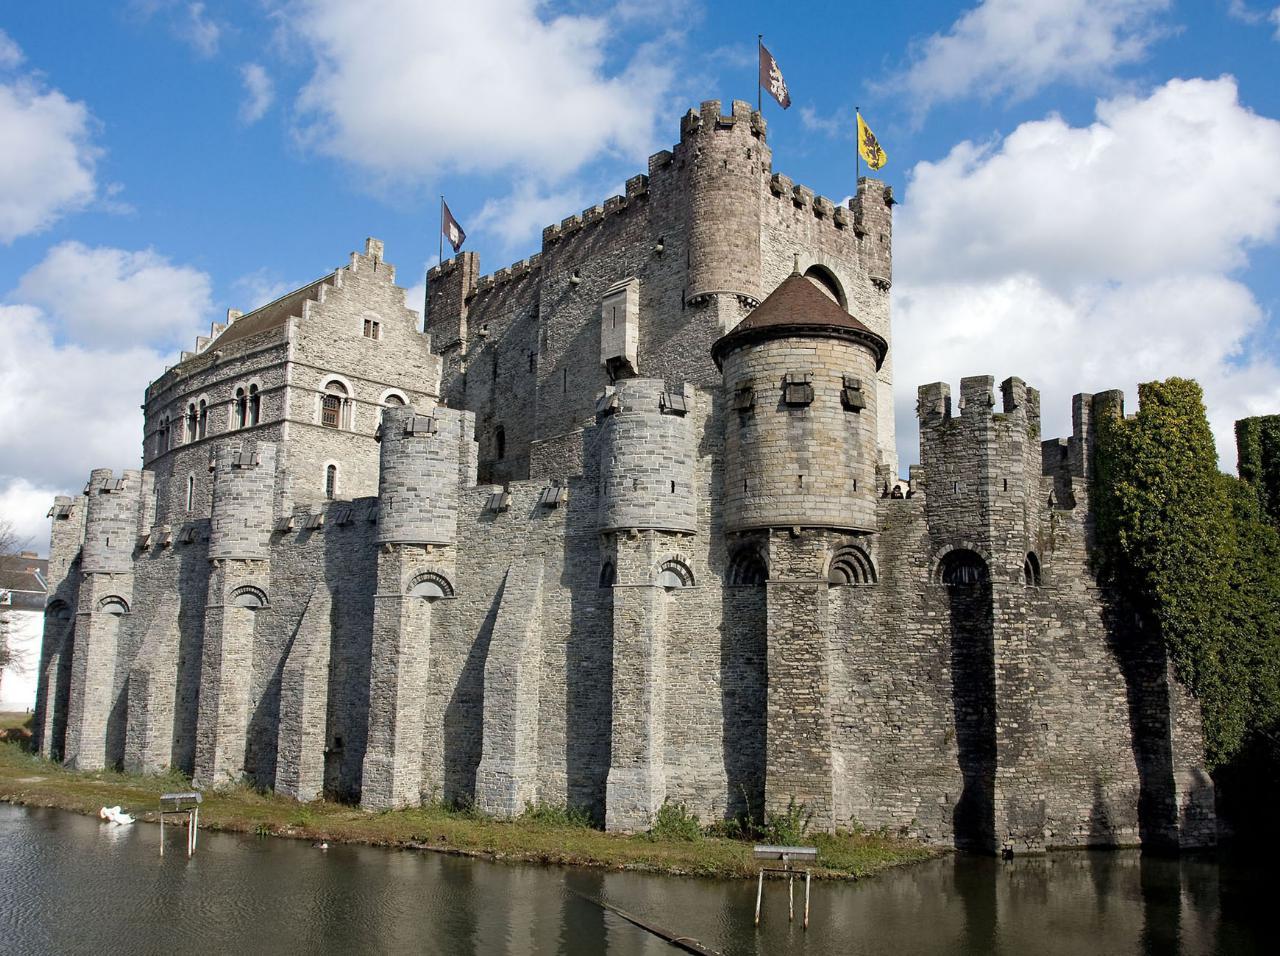 8. Gravensteen (Bélgica)